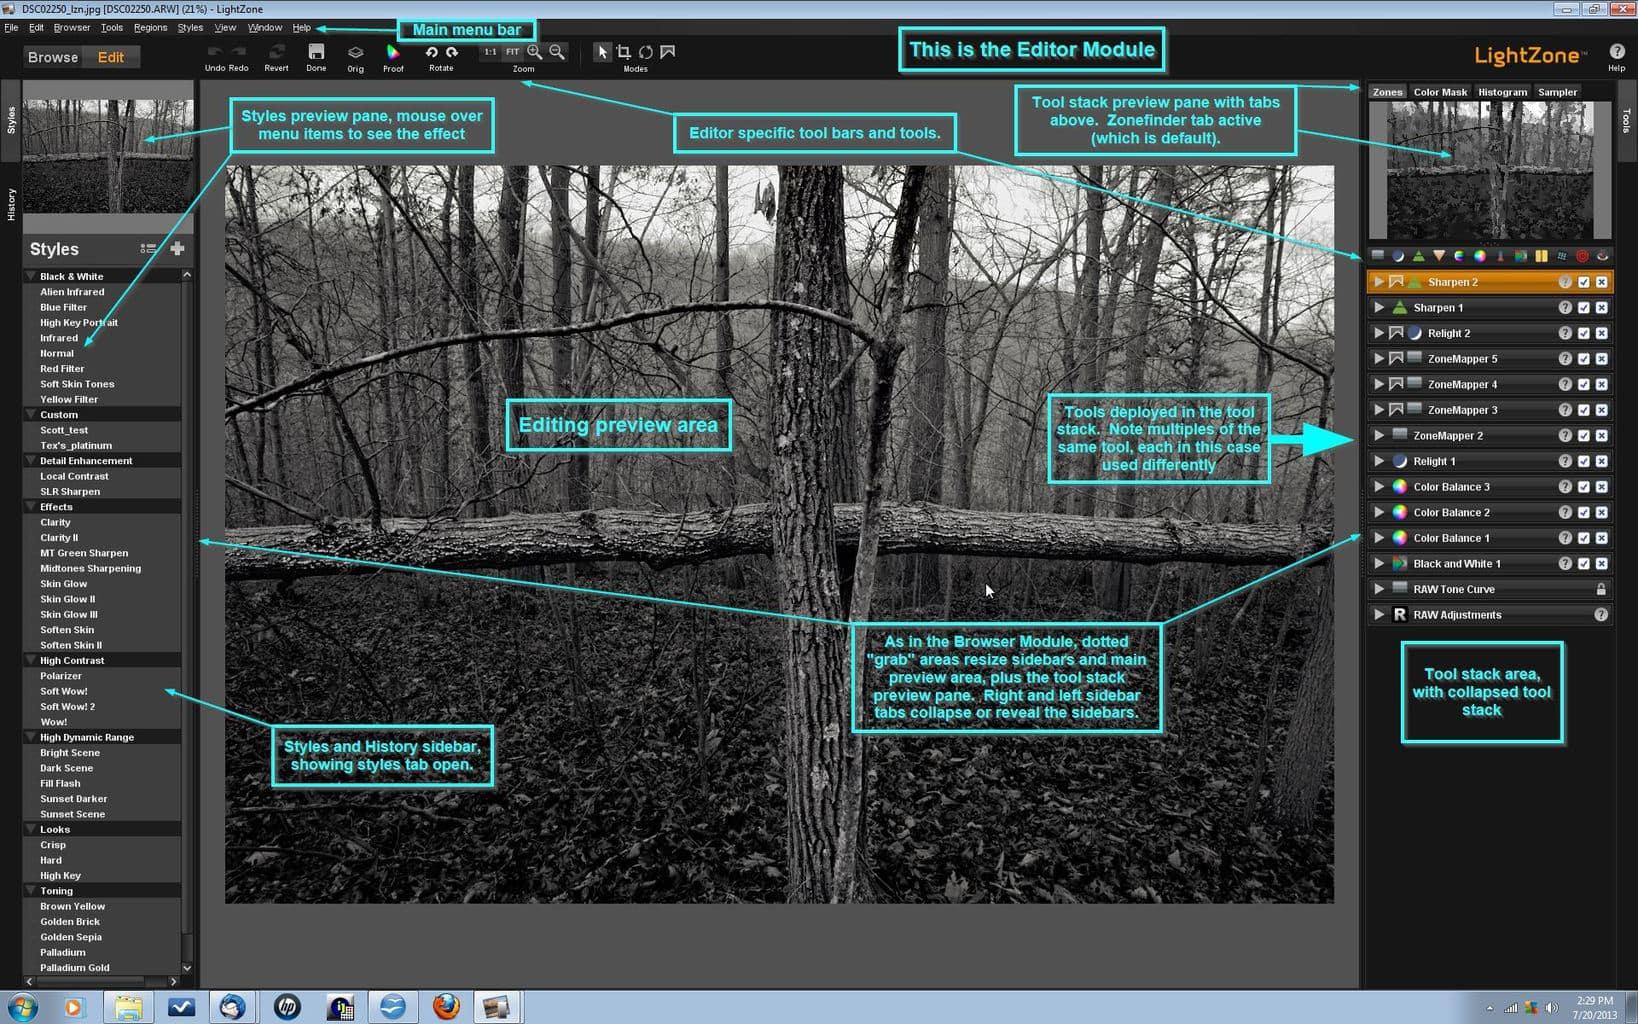 Interfaz del programa de edición de fotos Lightzone